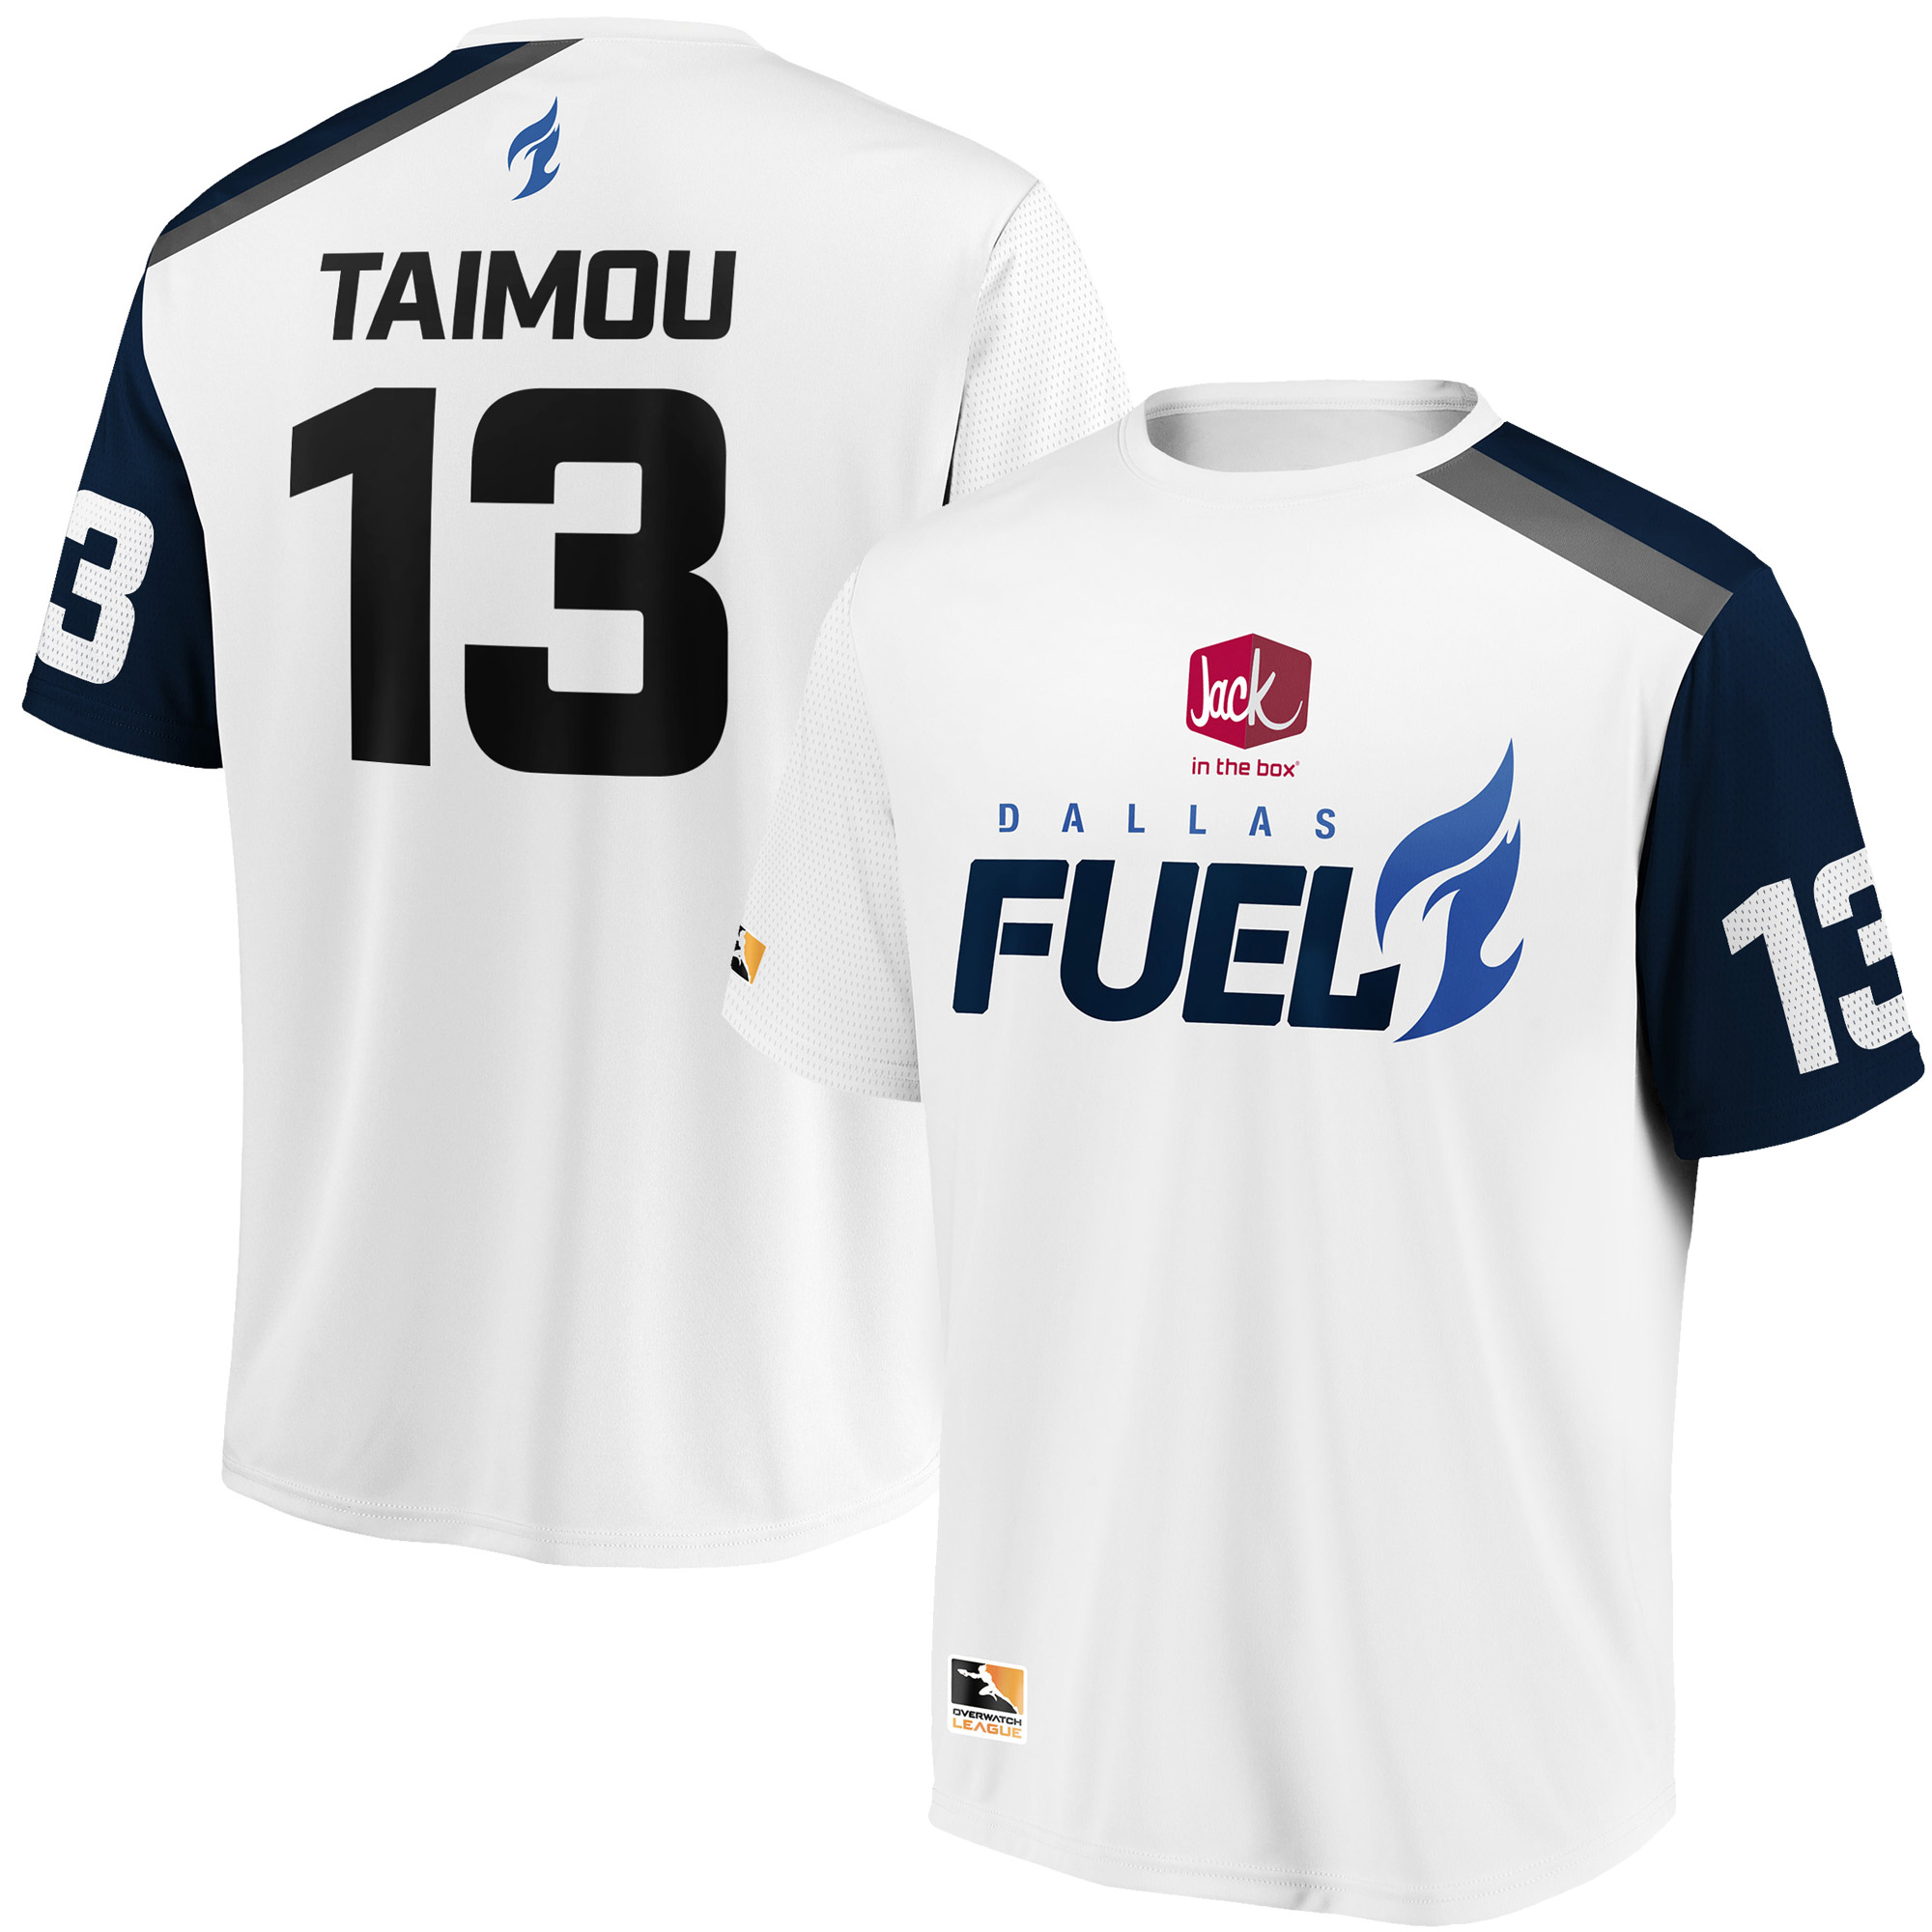 Taimou Dallas Fuel Overwatch League Replica Away Jersey - White